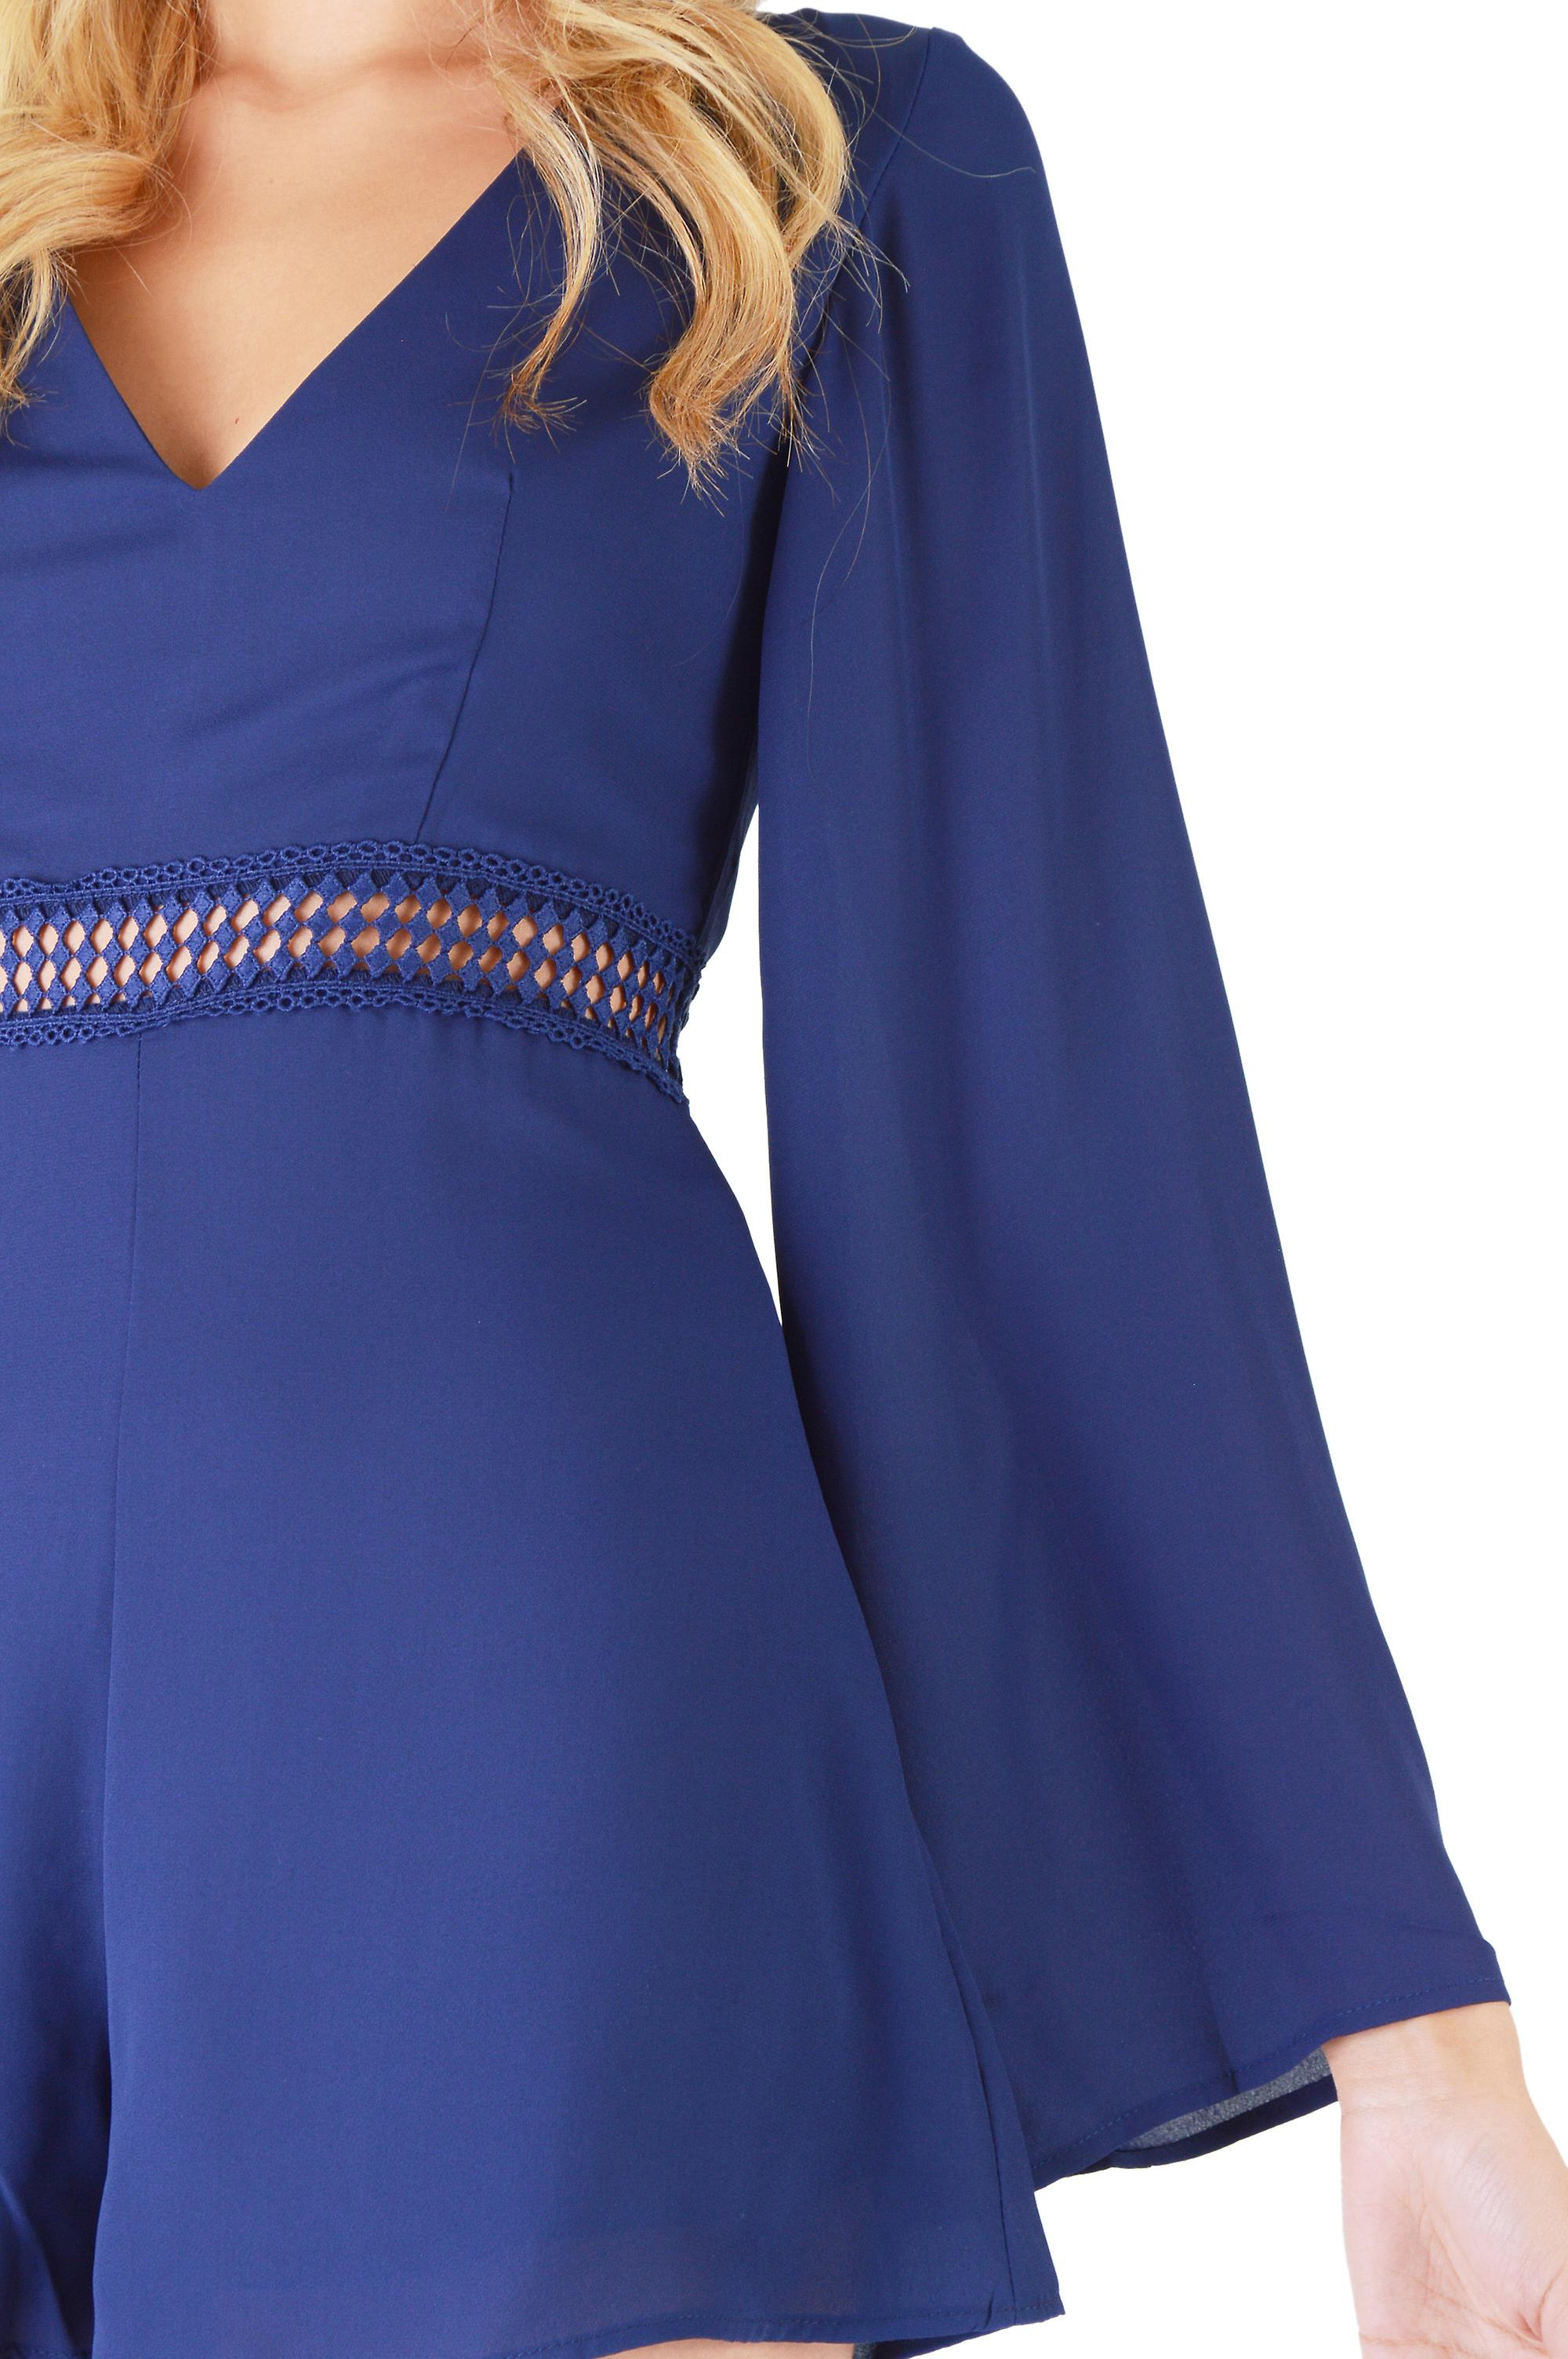 WYLDR Navy Blue V-Neck Playsuit With Waistline Crochet